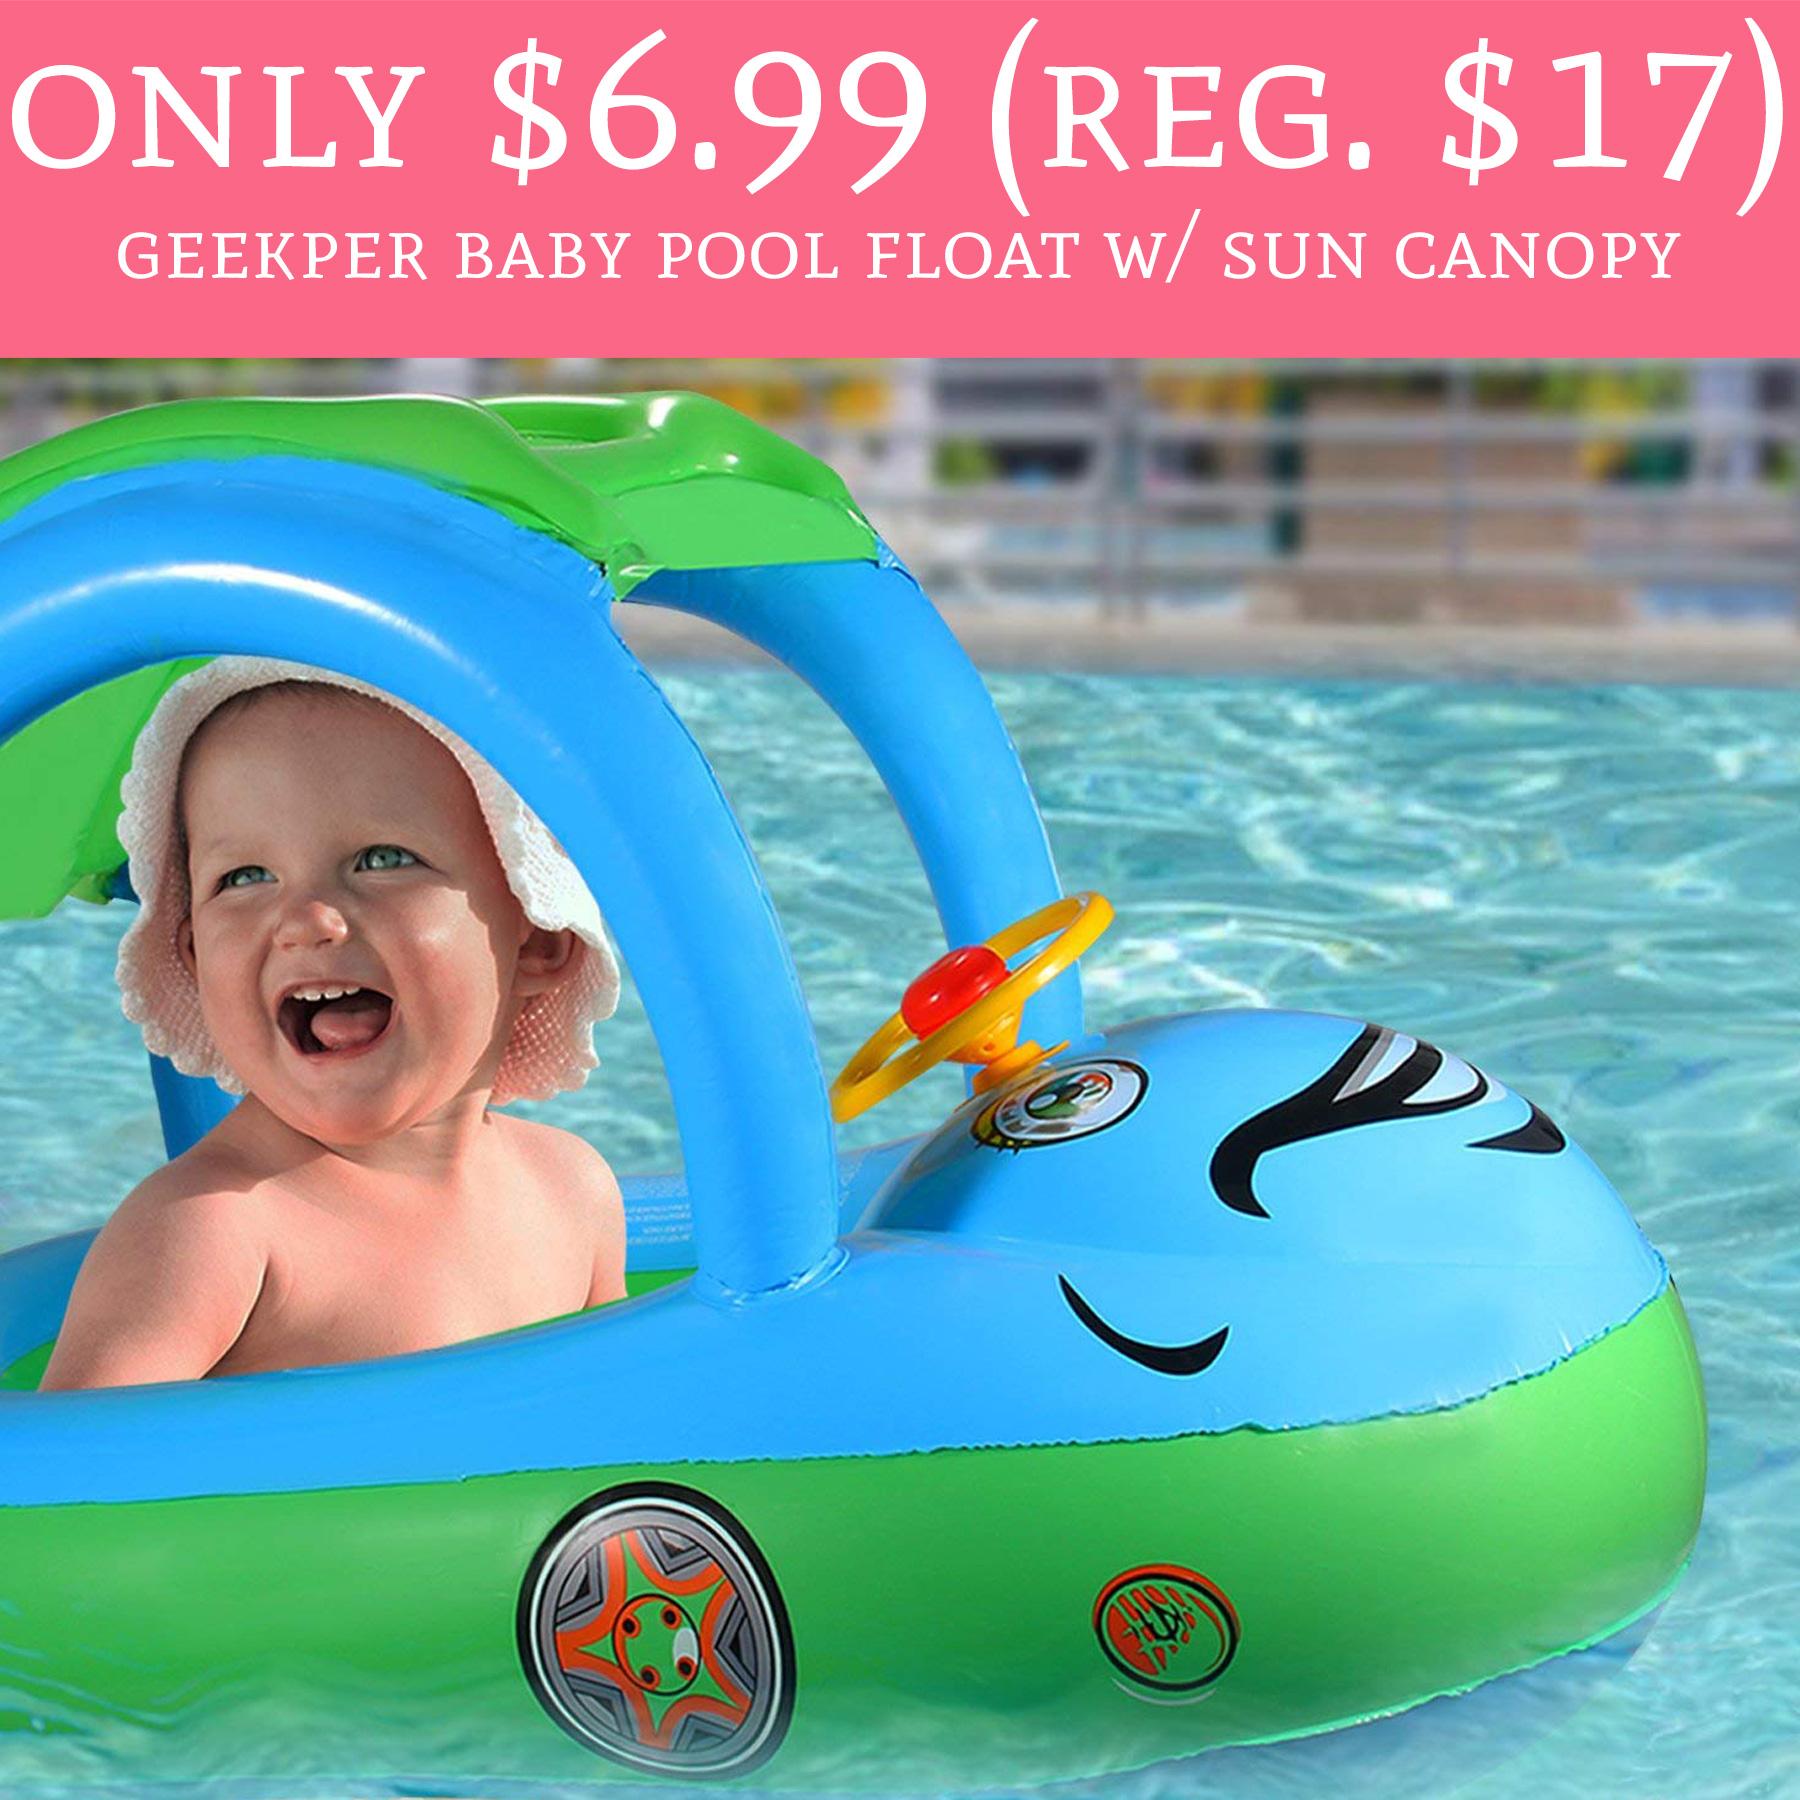 Only $6.99 (Regular $17) Geekper Baby Pool Float w/ Sun Canopy ...